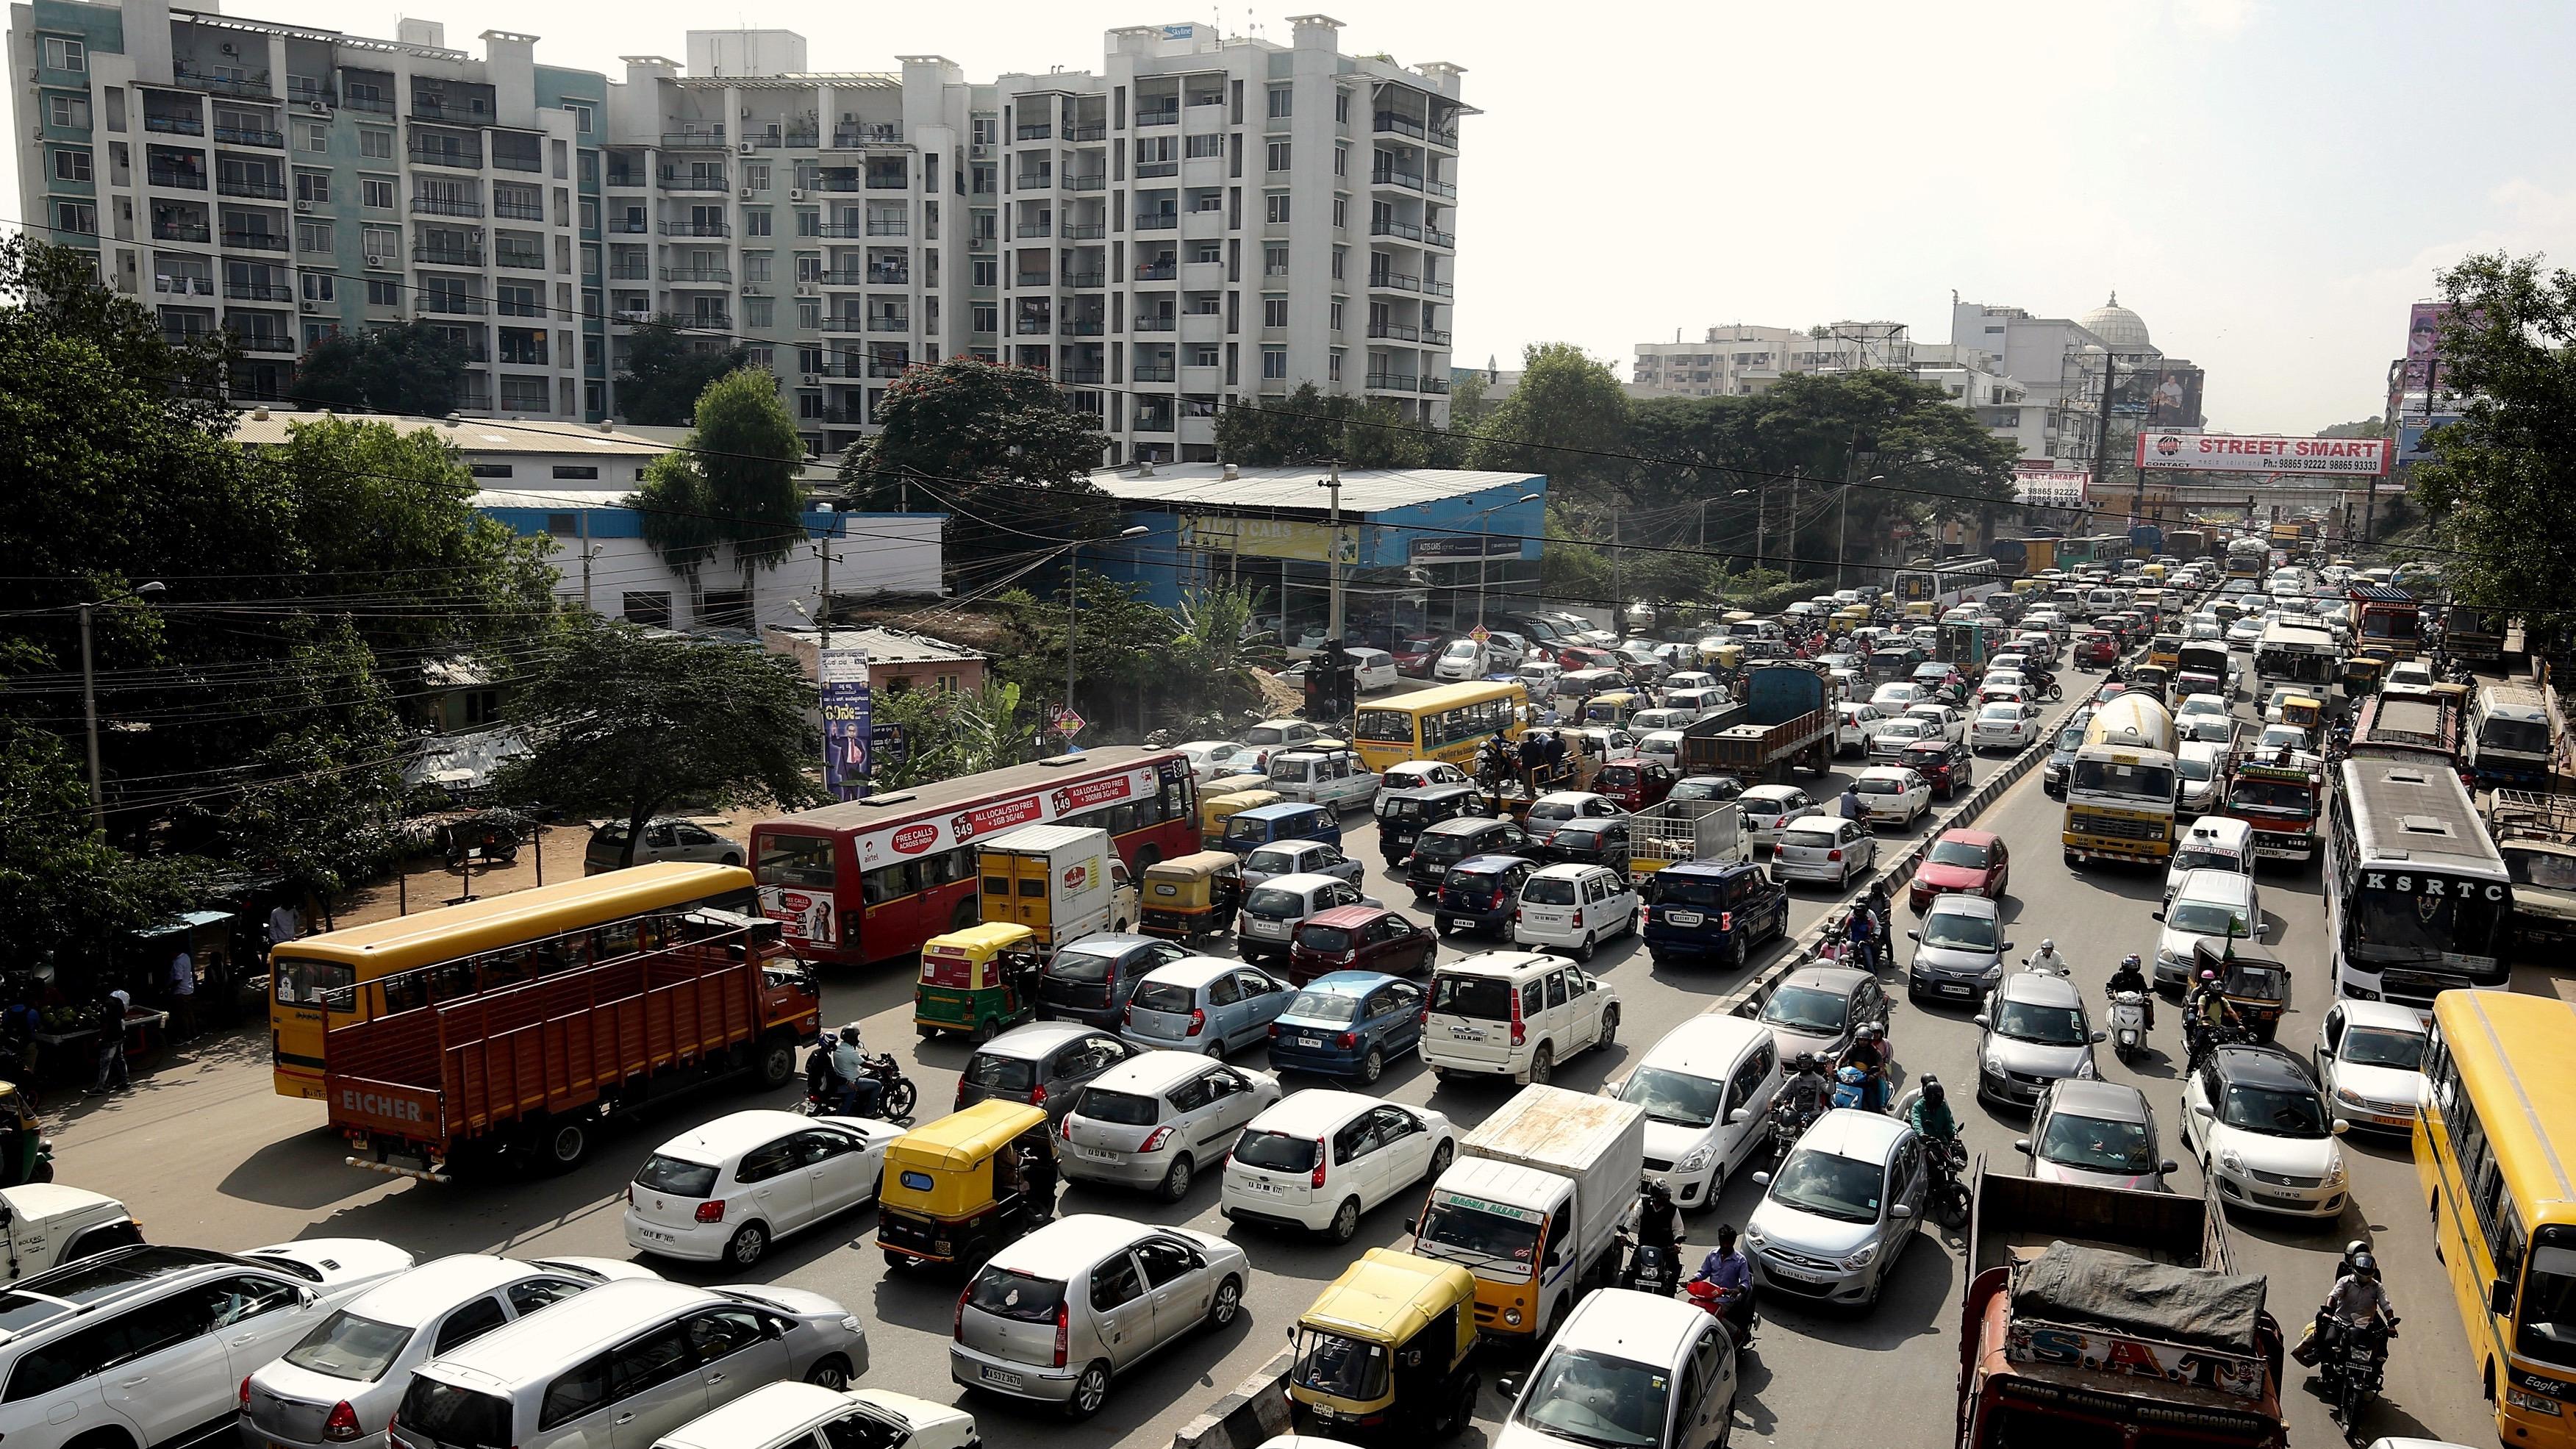 epa05679436 Cars, buses, trucks and rickshaws stop in a halt at a massive traffic jam in Bangalore, India, 16 December 2016 (Issued 17 December 2016).  EPA/JAGADEESH NV